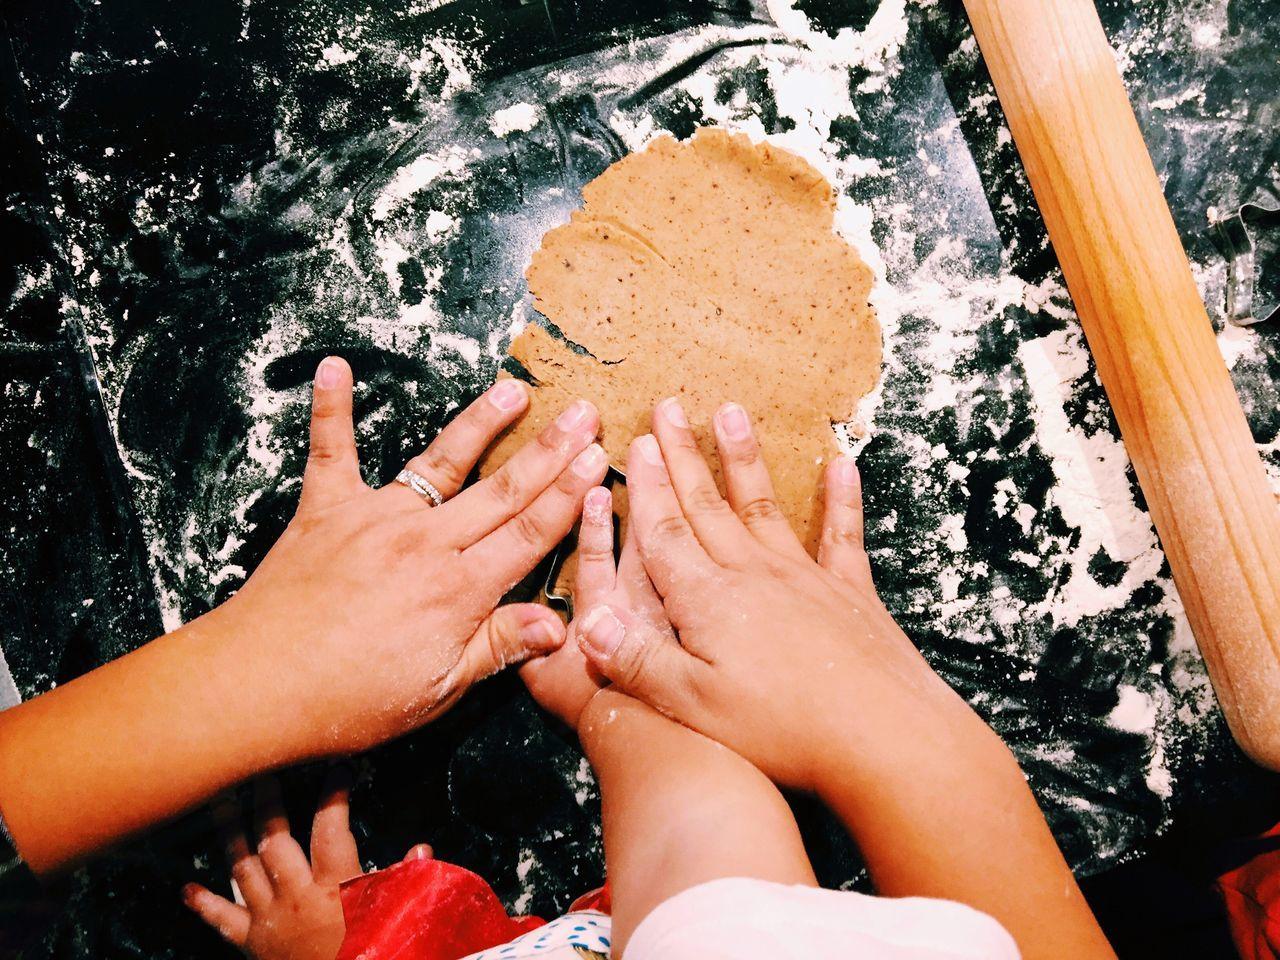 Preparing ginger bread cookies. Baking Christmas Preparations Cookies Jul Family Children Photography Children Hand Handmade Gingerbread